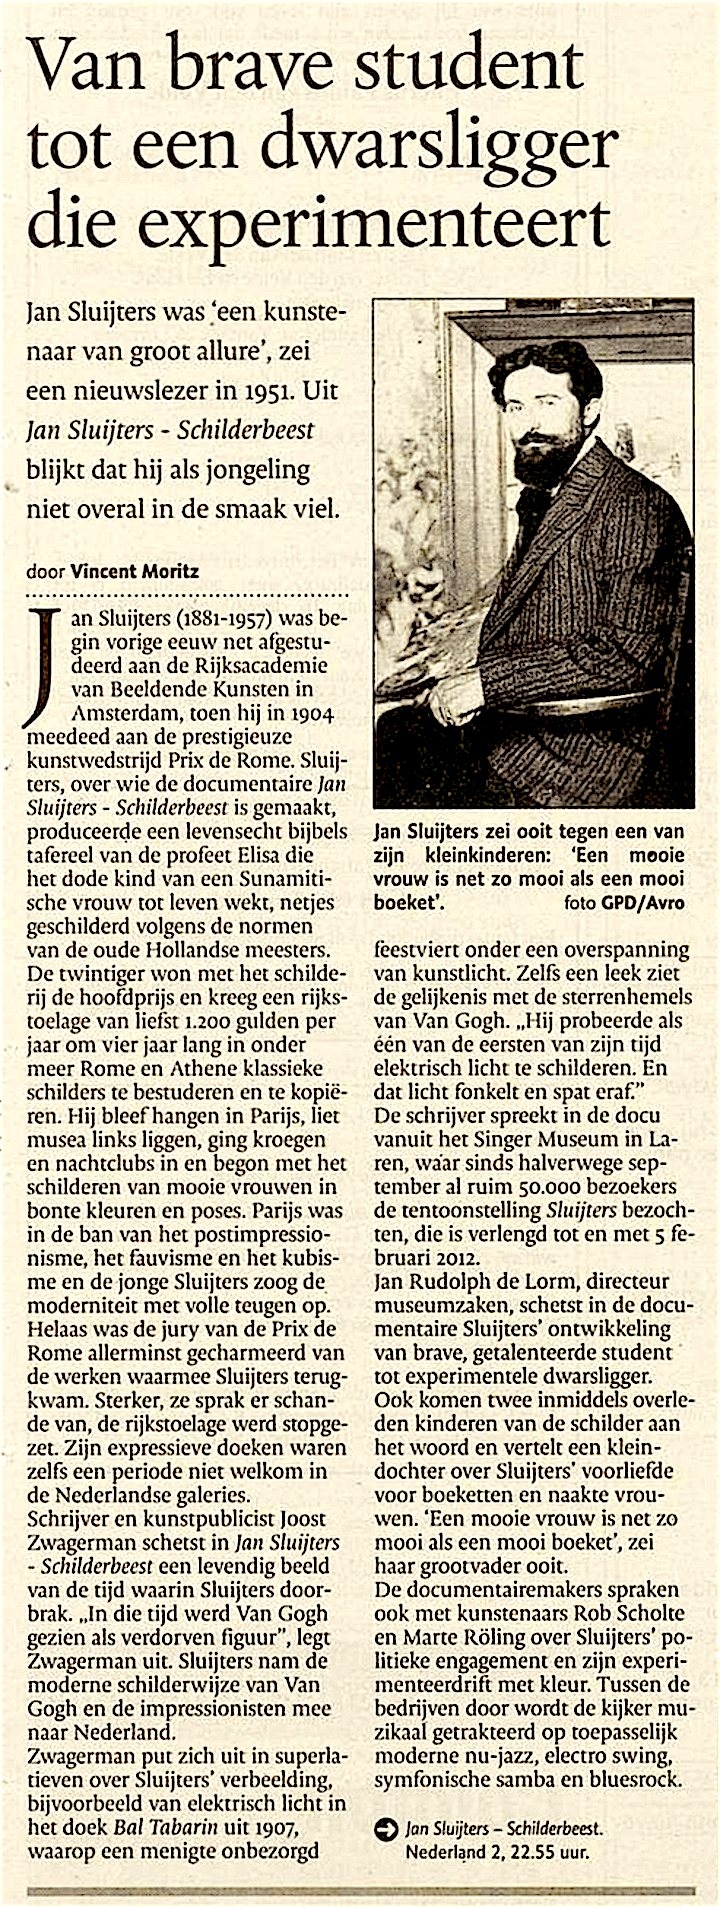 Provinciale Zeeuwse Courant | 2011 | 13 december 2011 | pagina 30